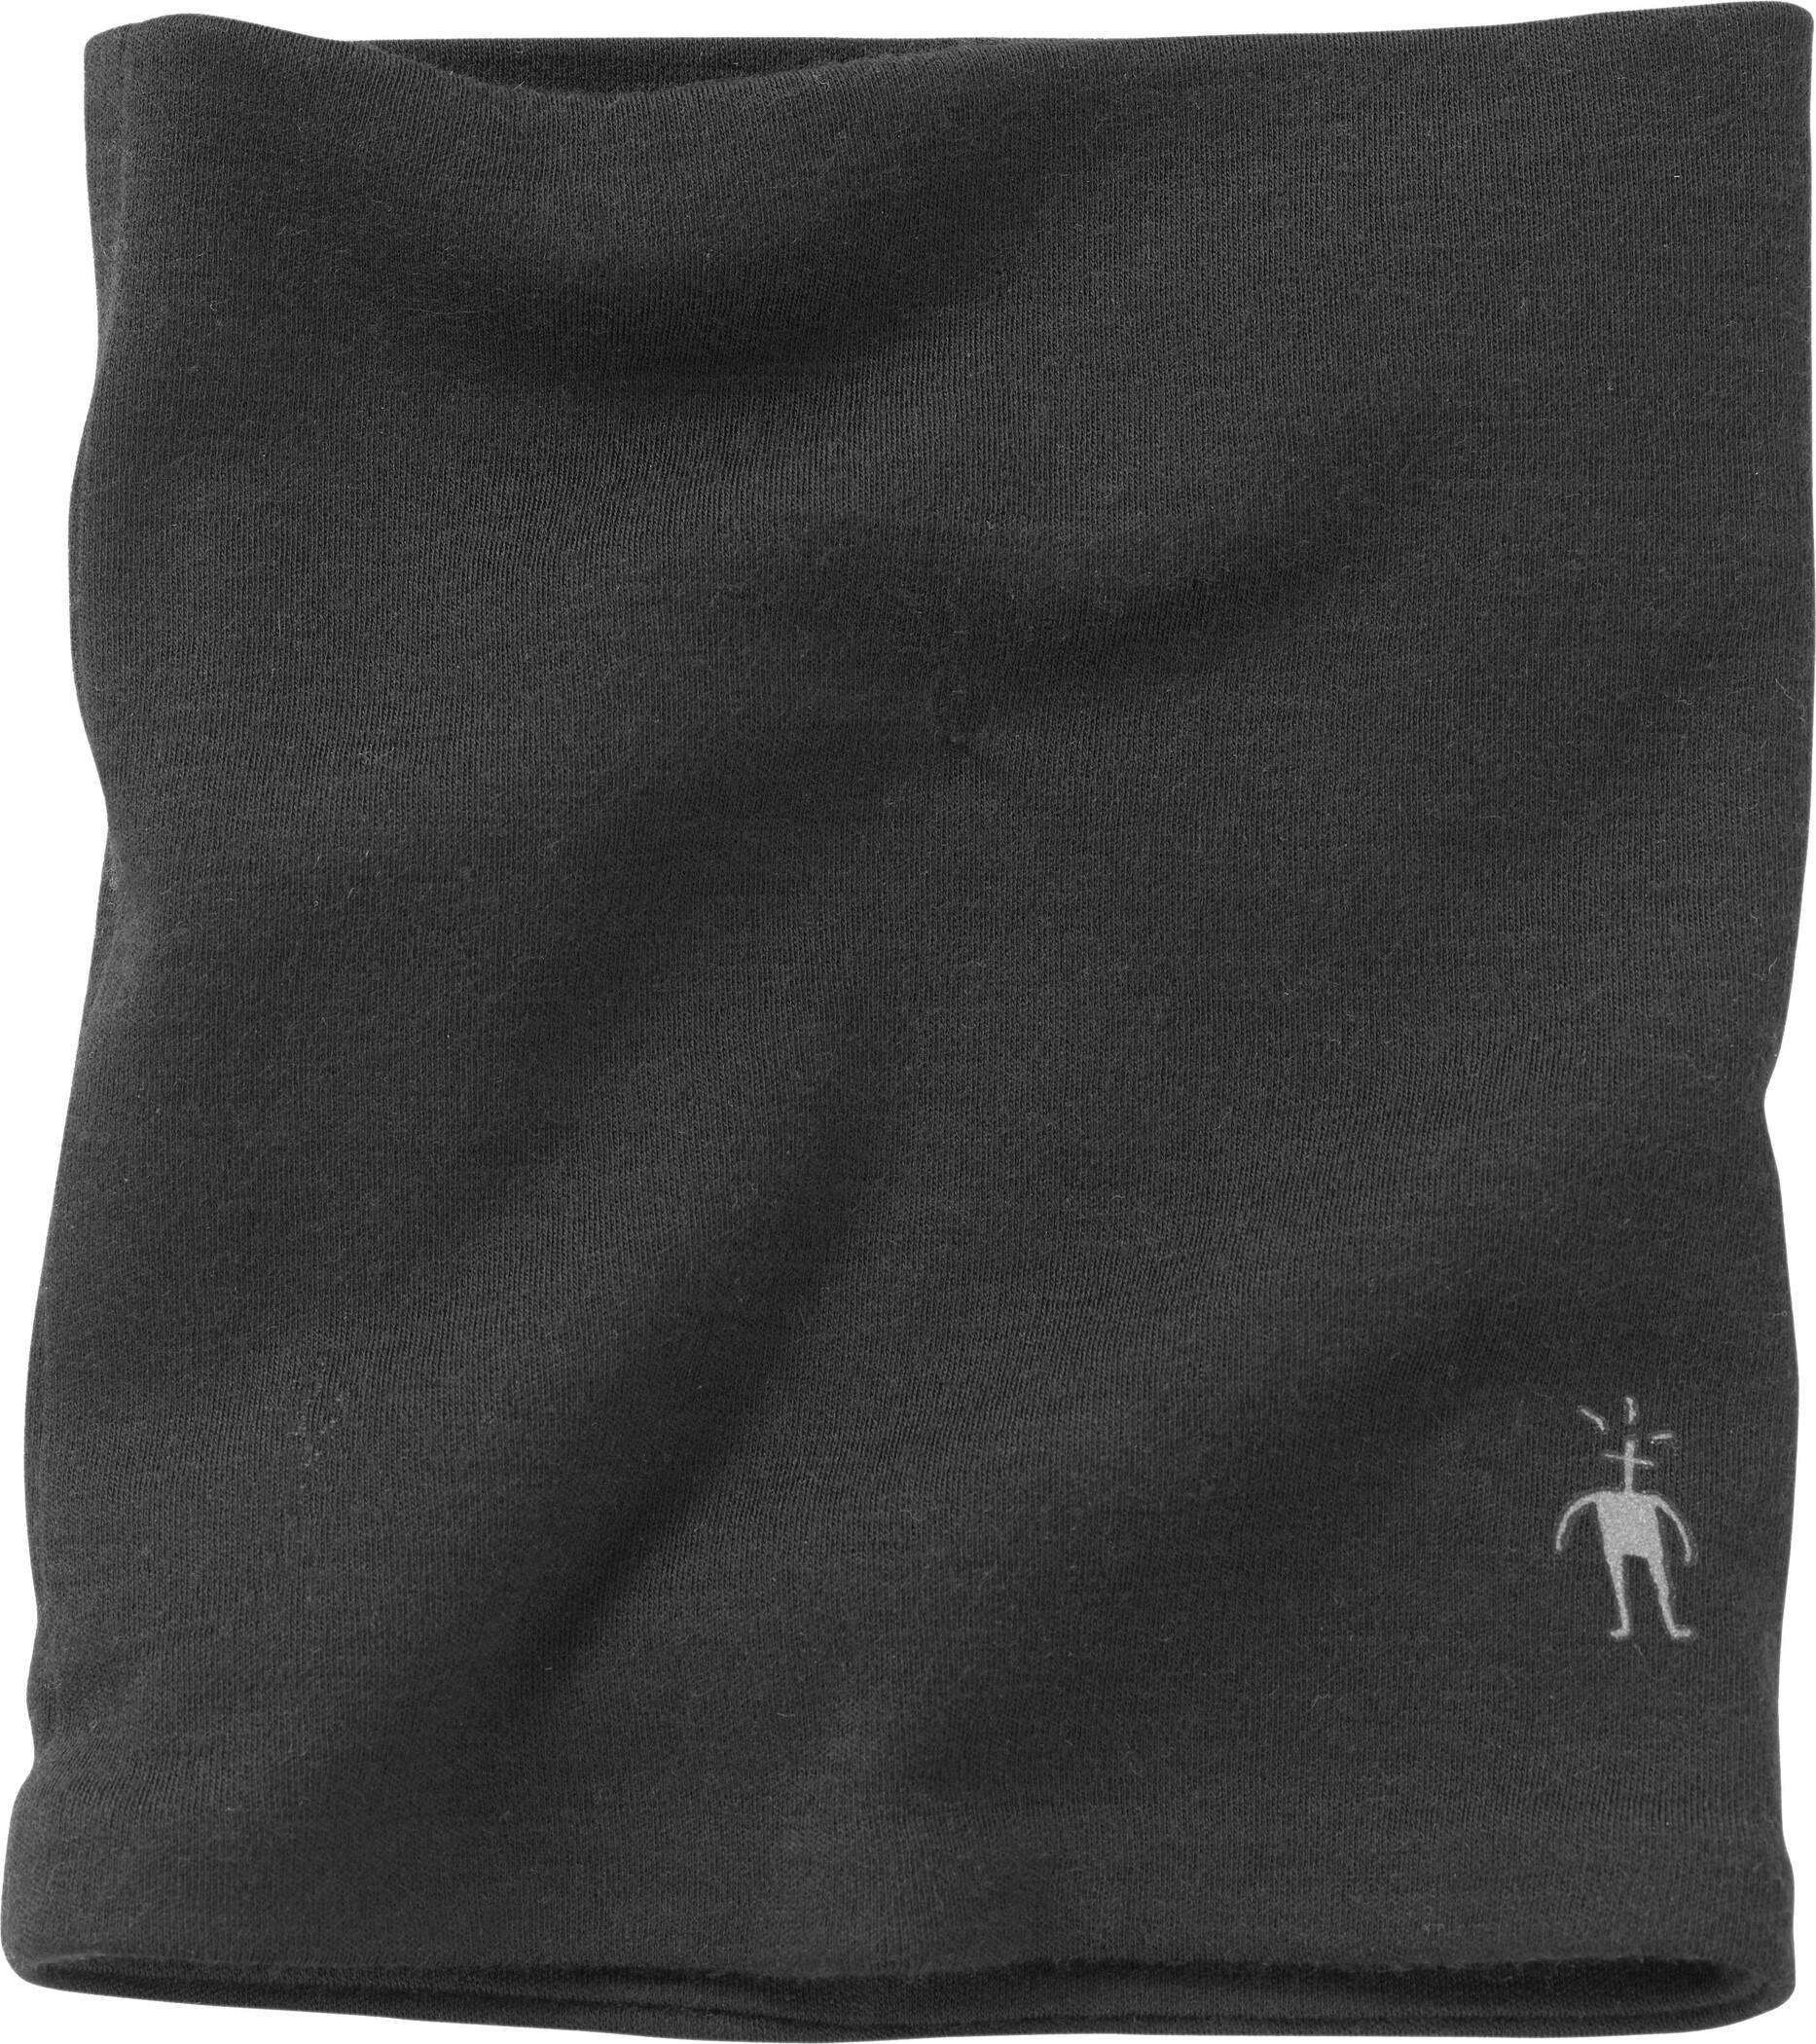 Smartwool Merino 250 Halsedisse, black (2019) | Headwear